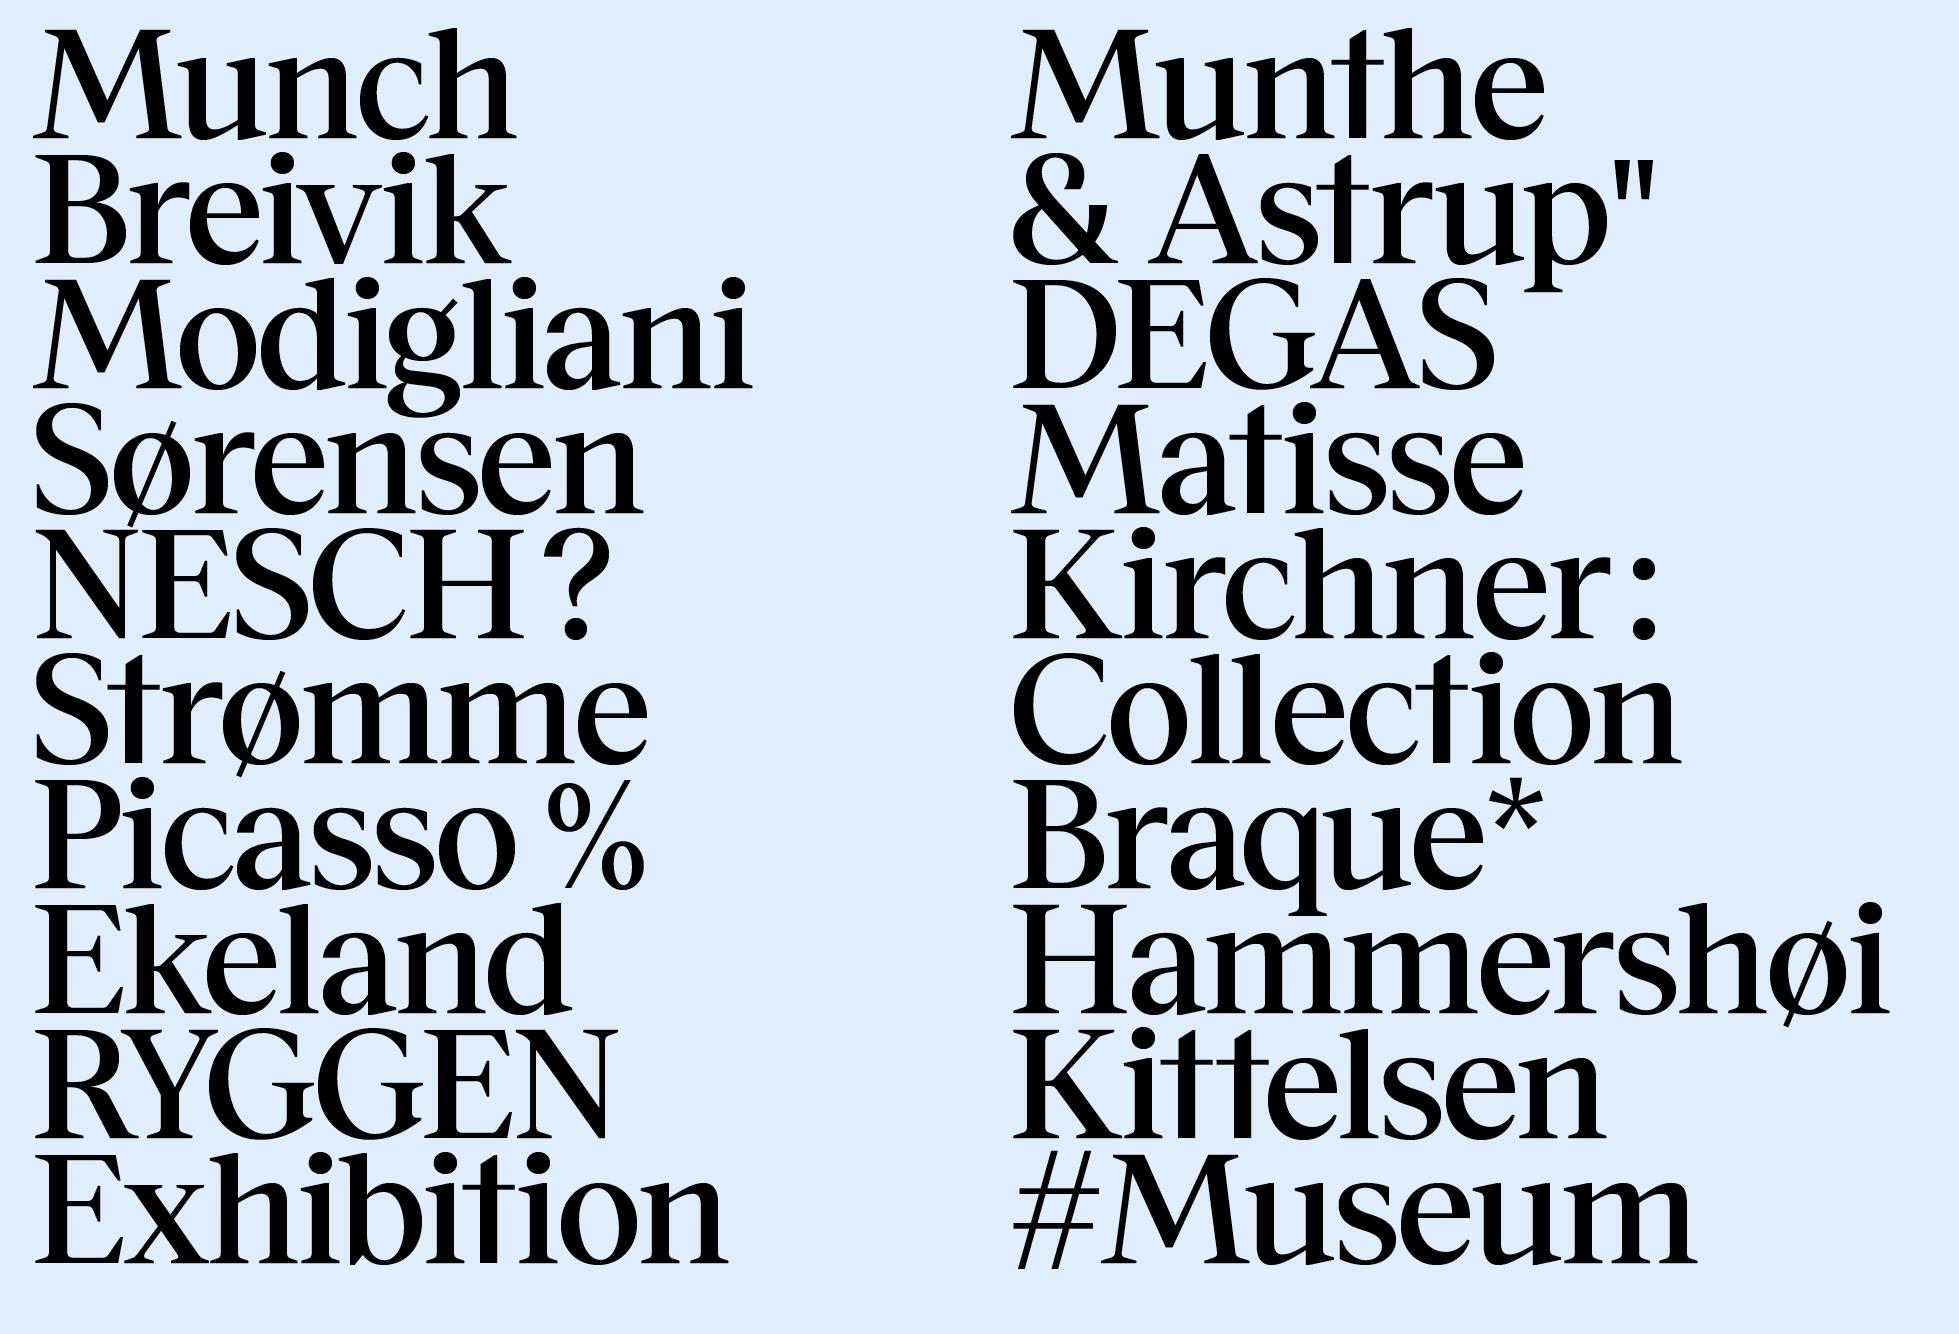 Museet Serif Medium (Artists)